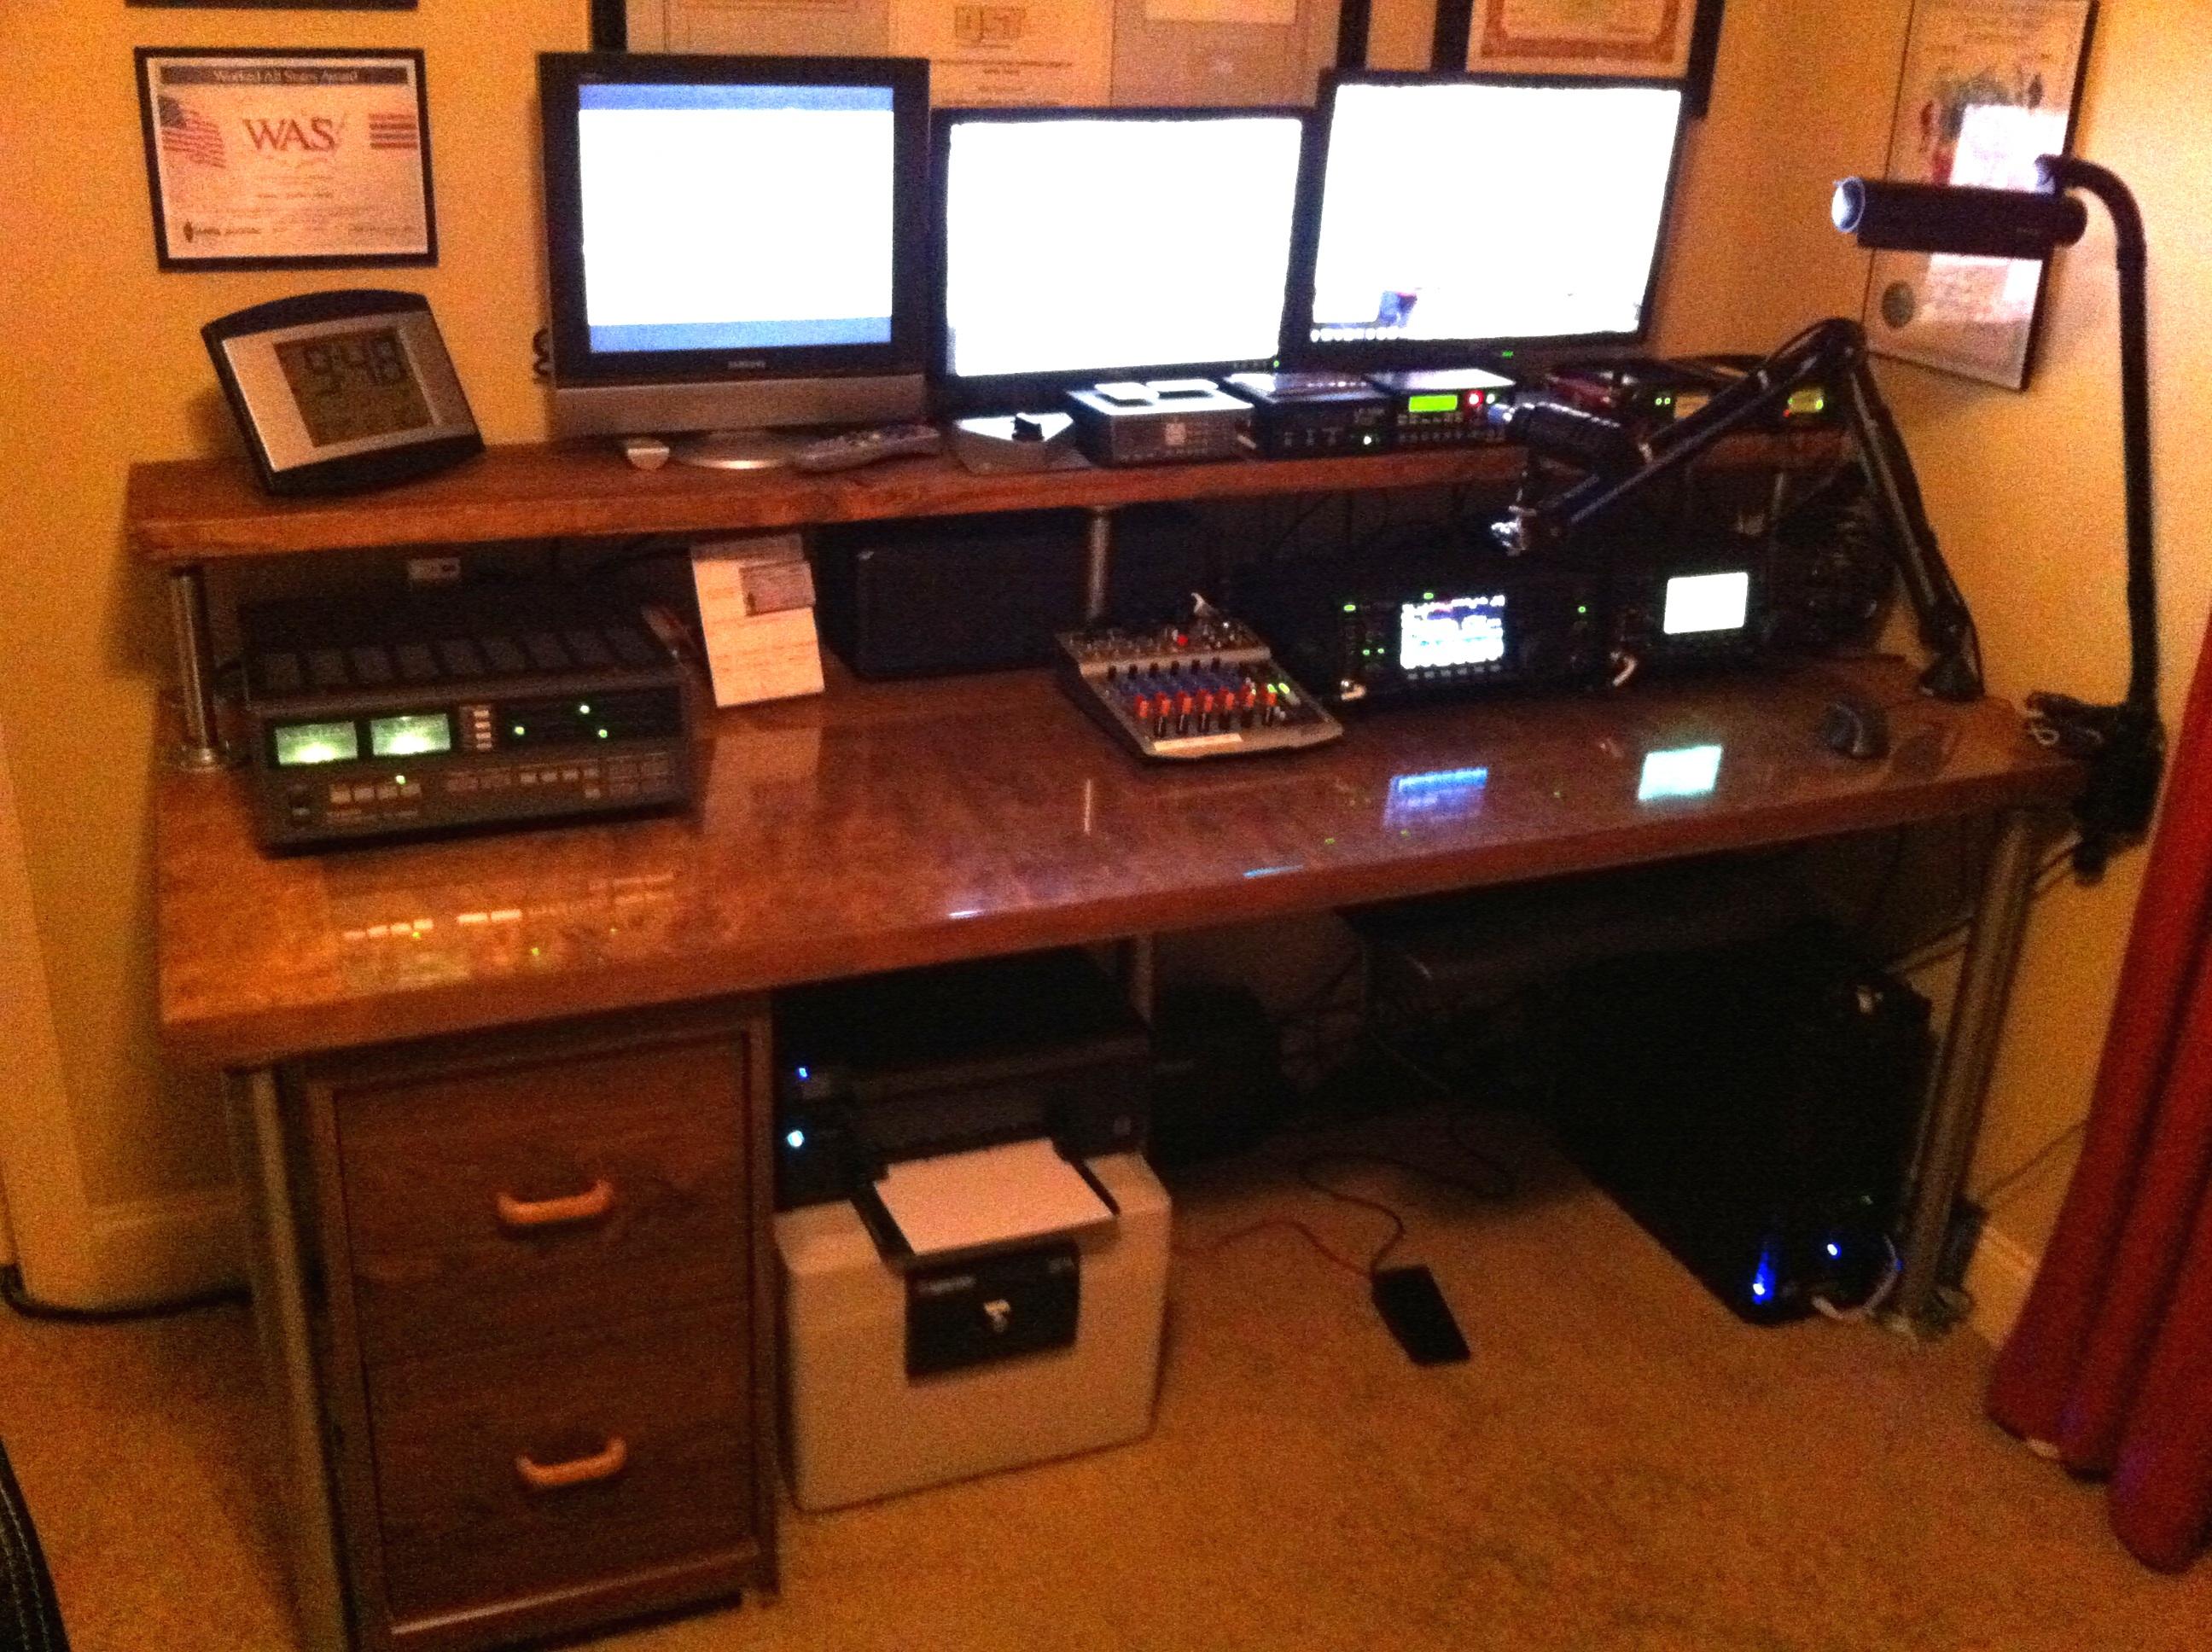 Ham Radio Desk Plans Blueprints gary rogowski woodworking